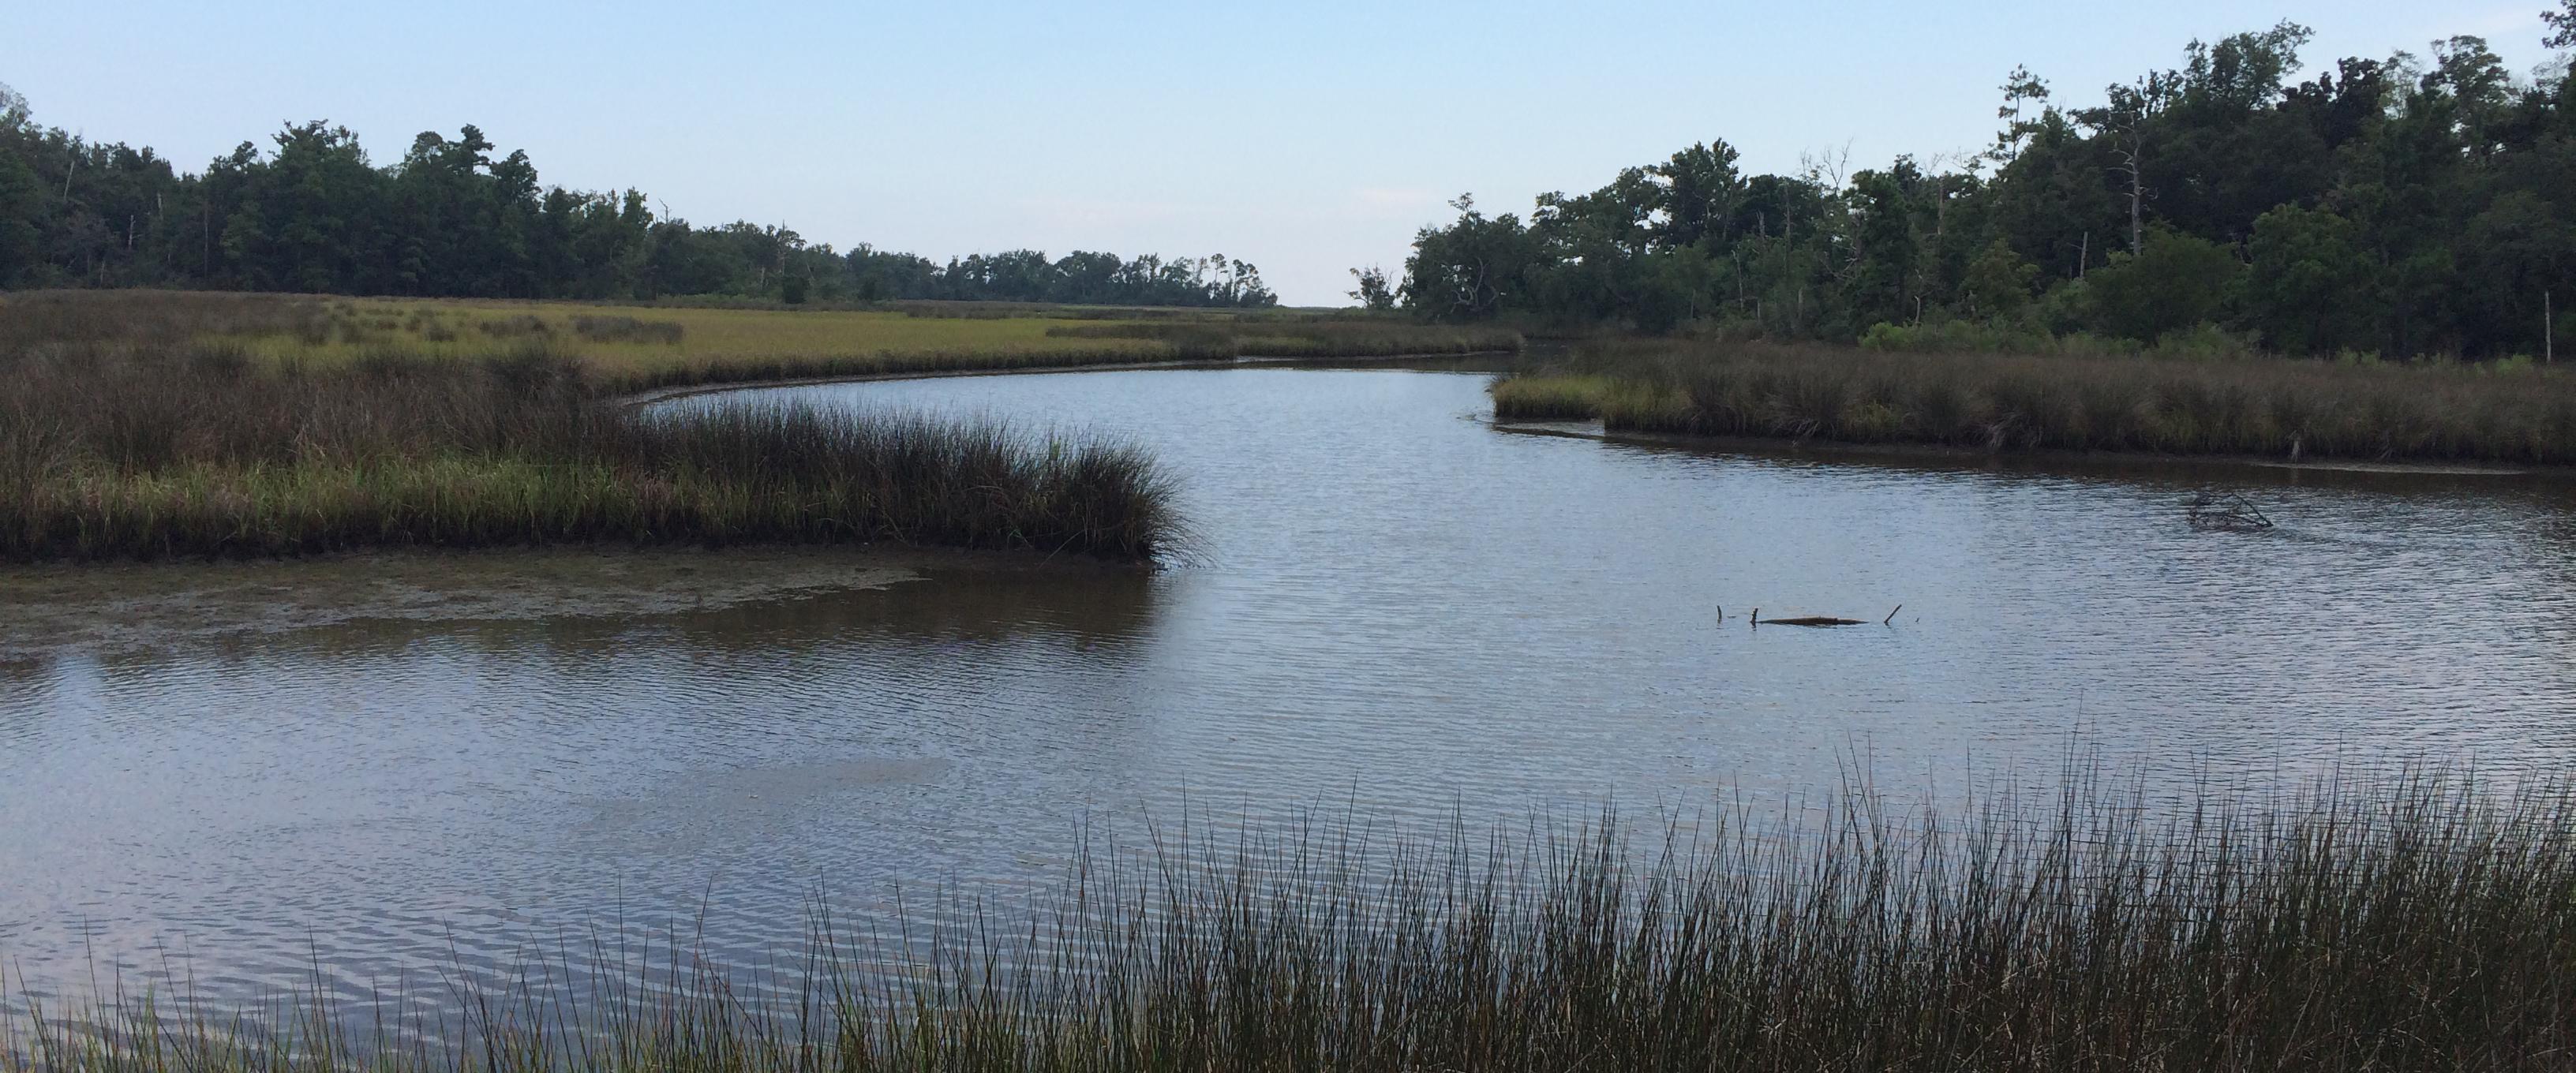 Alabama Releases Second Restoration Plan